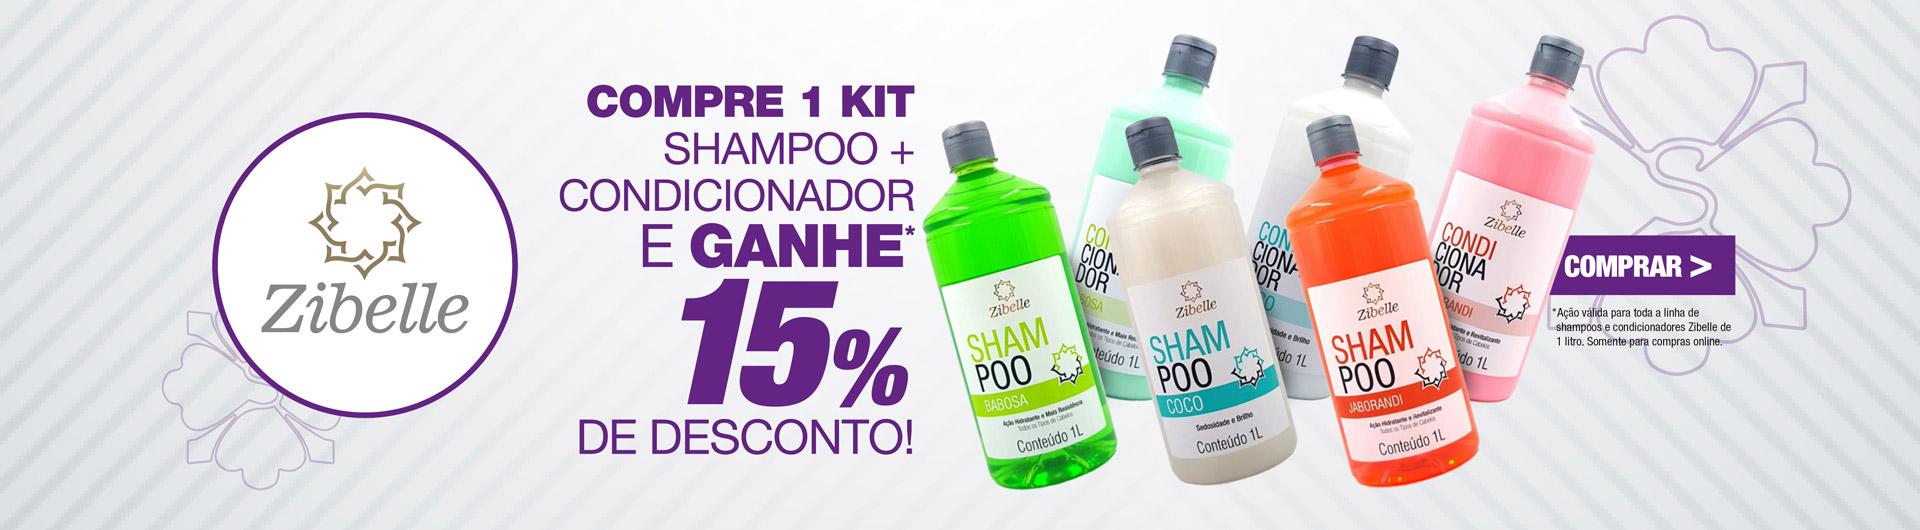 Zibelle Shampoo + Cond 15% Off